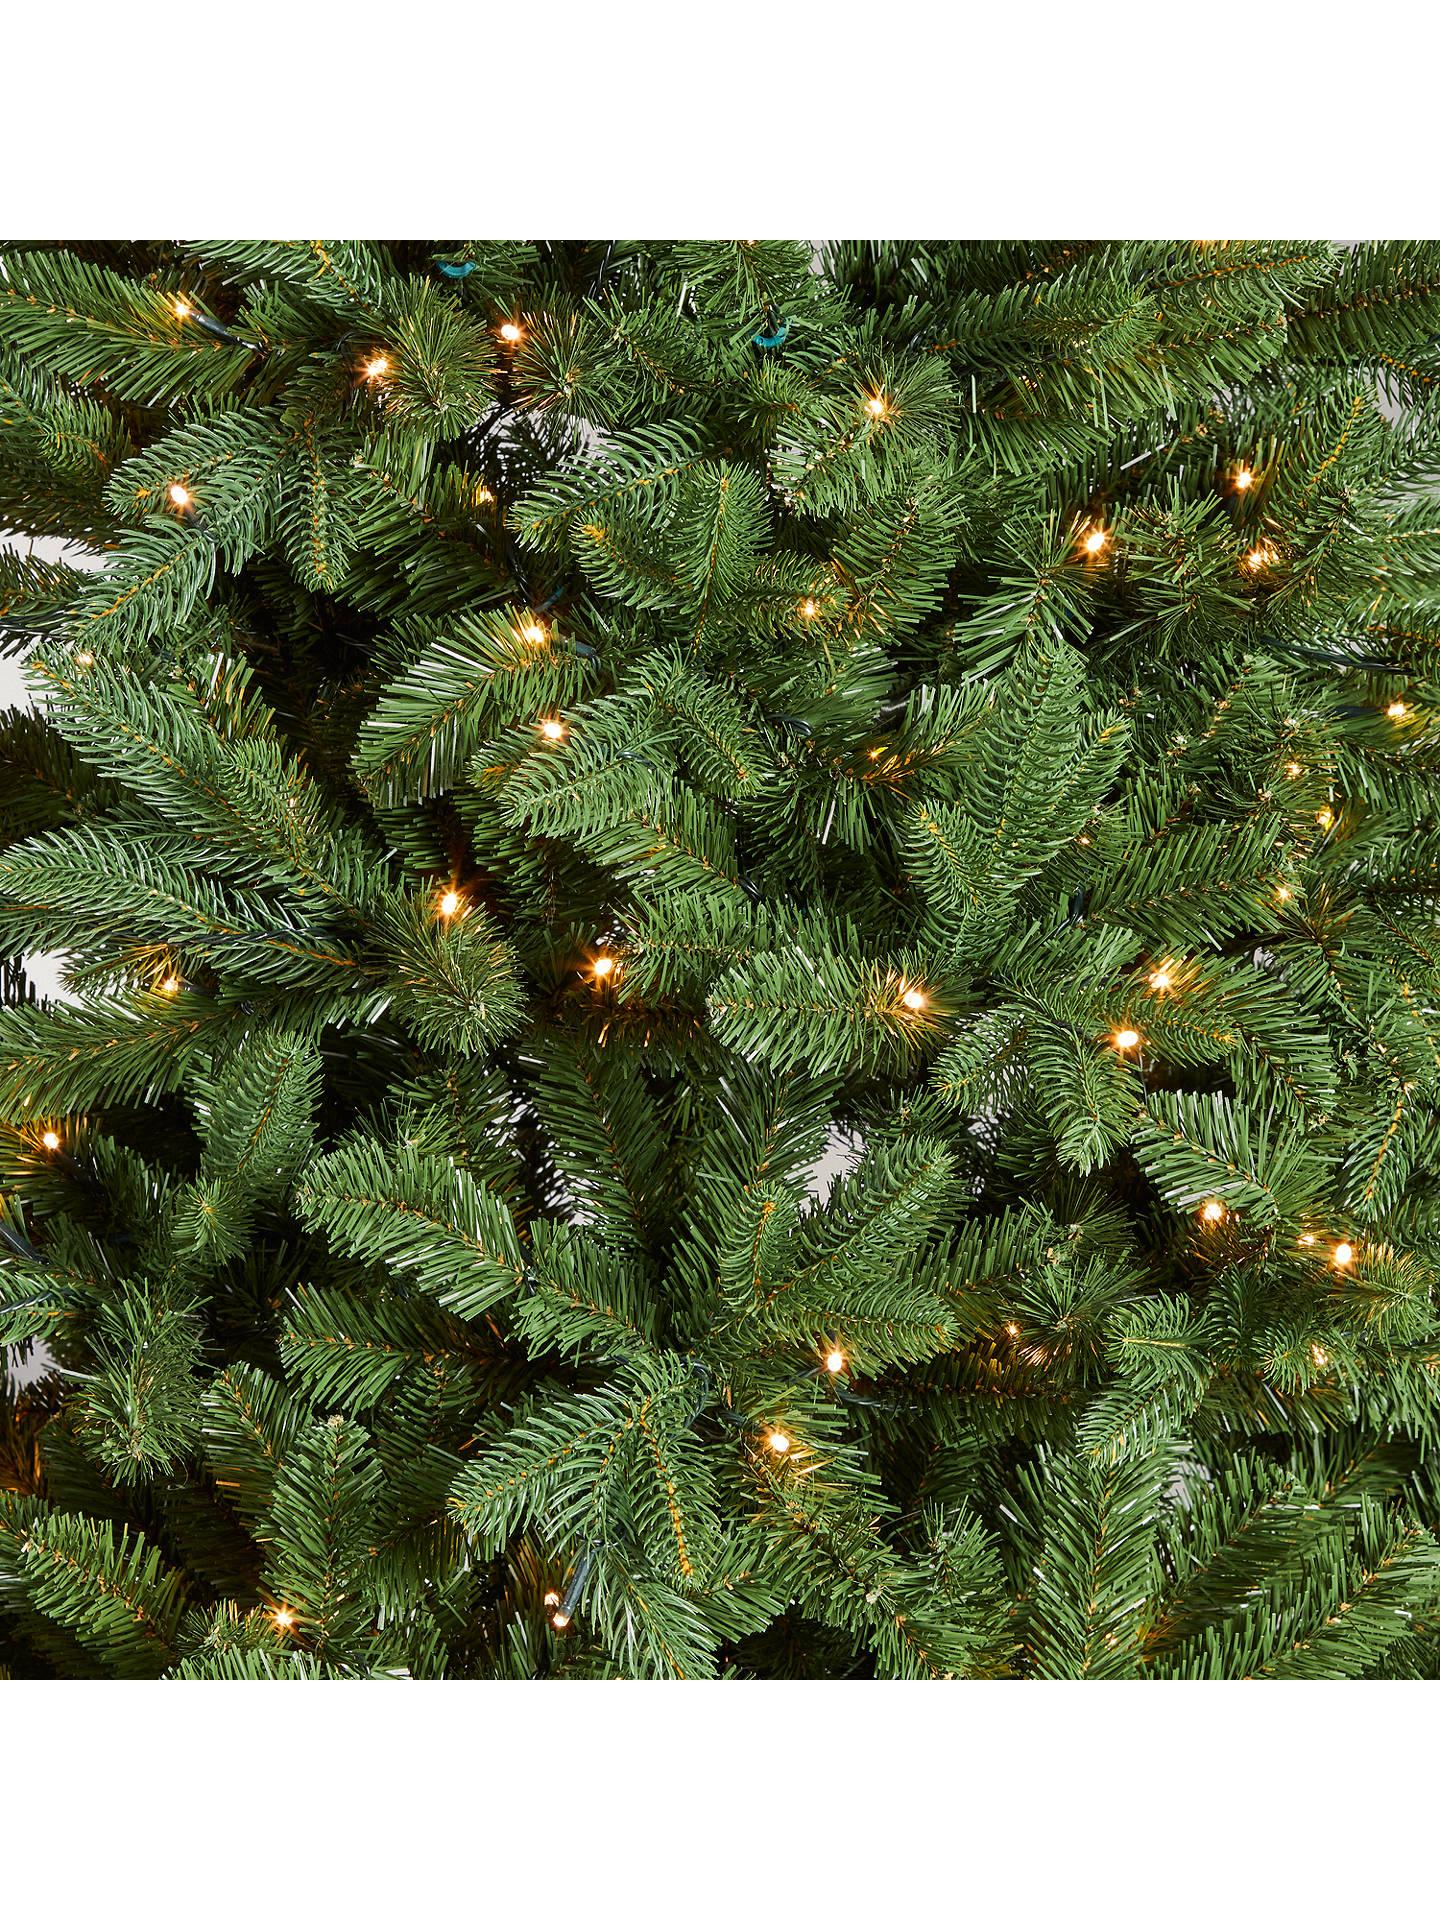 John Lewis & Partners Newington Pre-lit Christmas Tree, 7ft at John Lewis & Partners